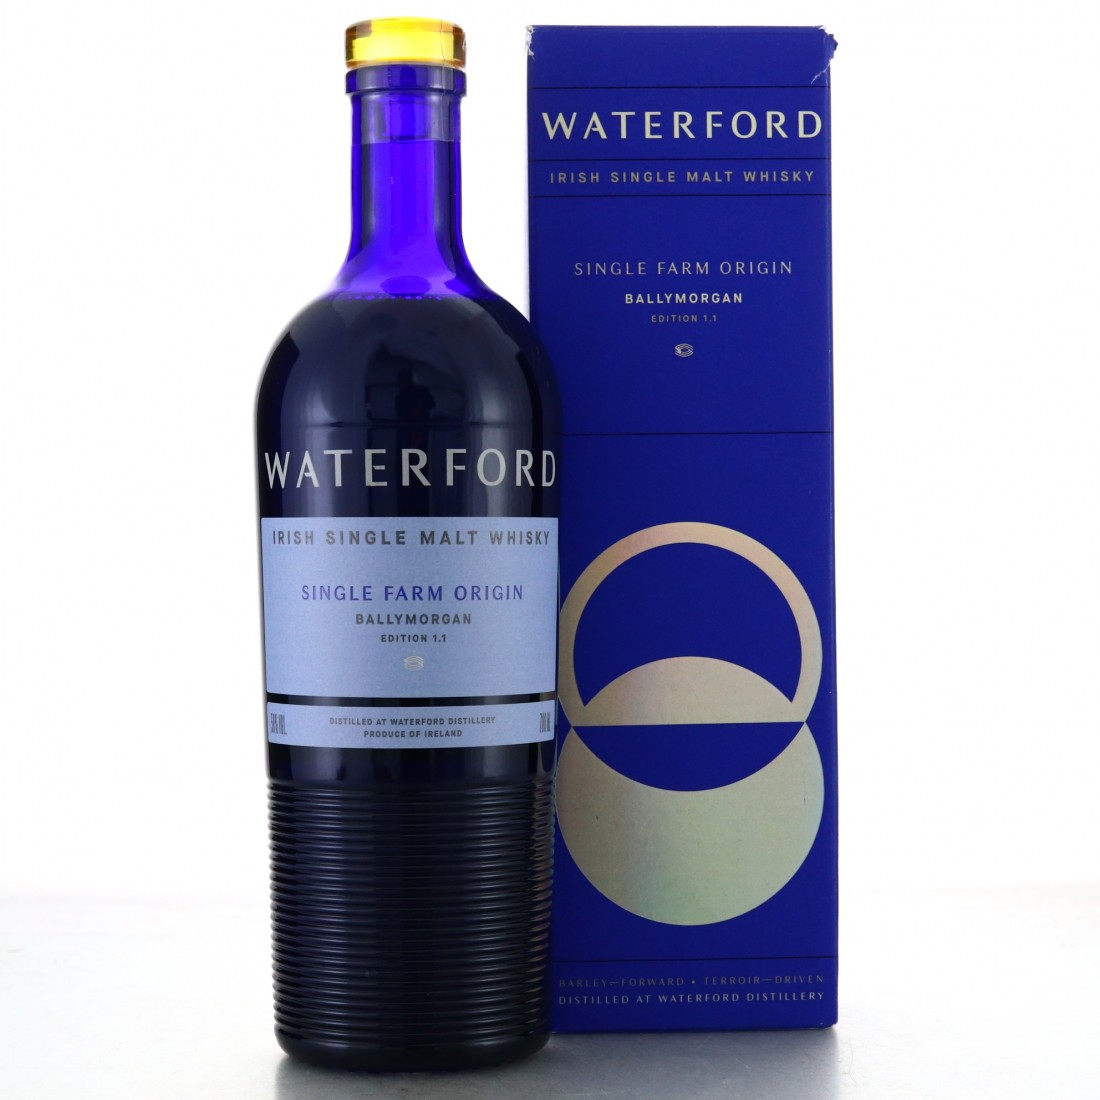 Waterford Single Farm Origin Edition 1.1 / Ballymorgan